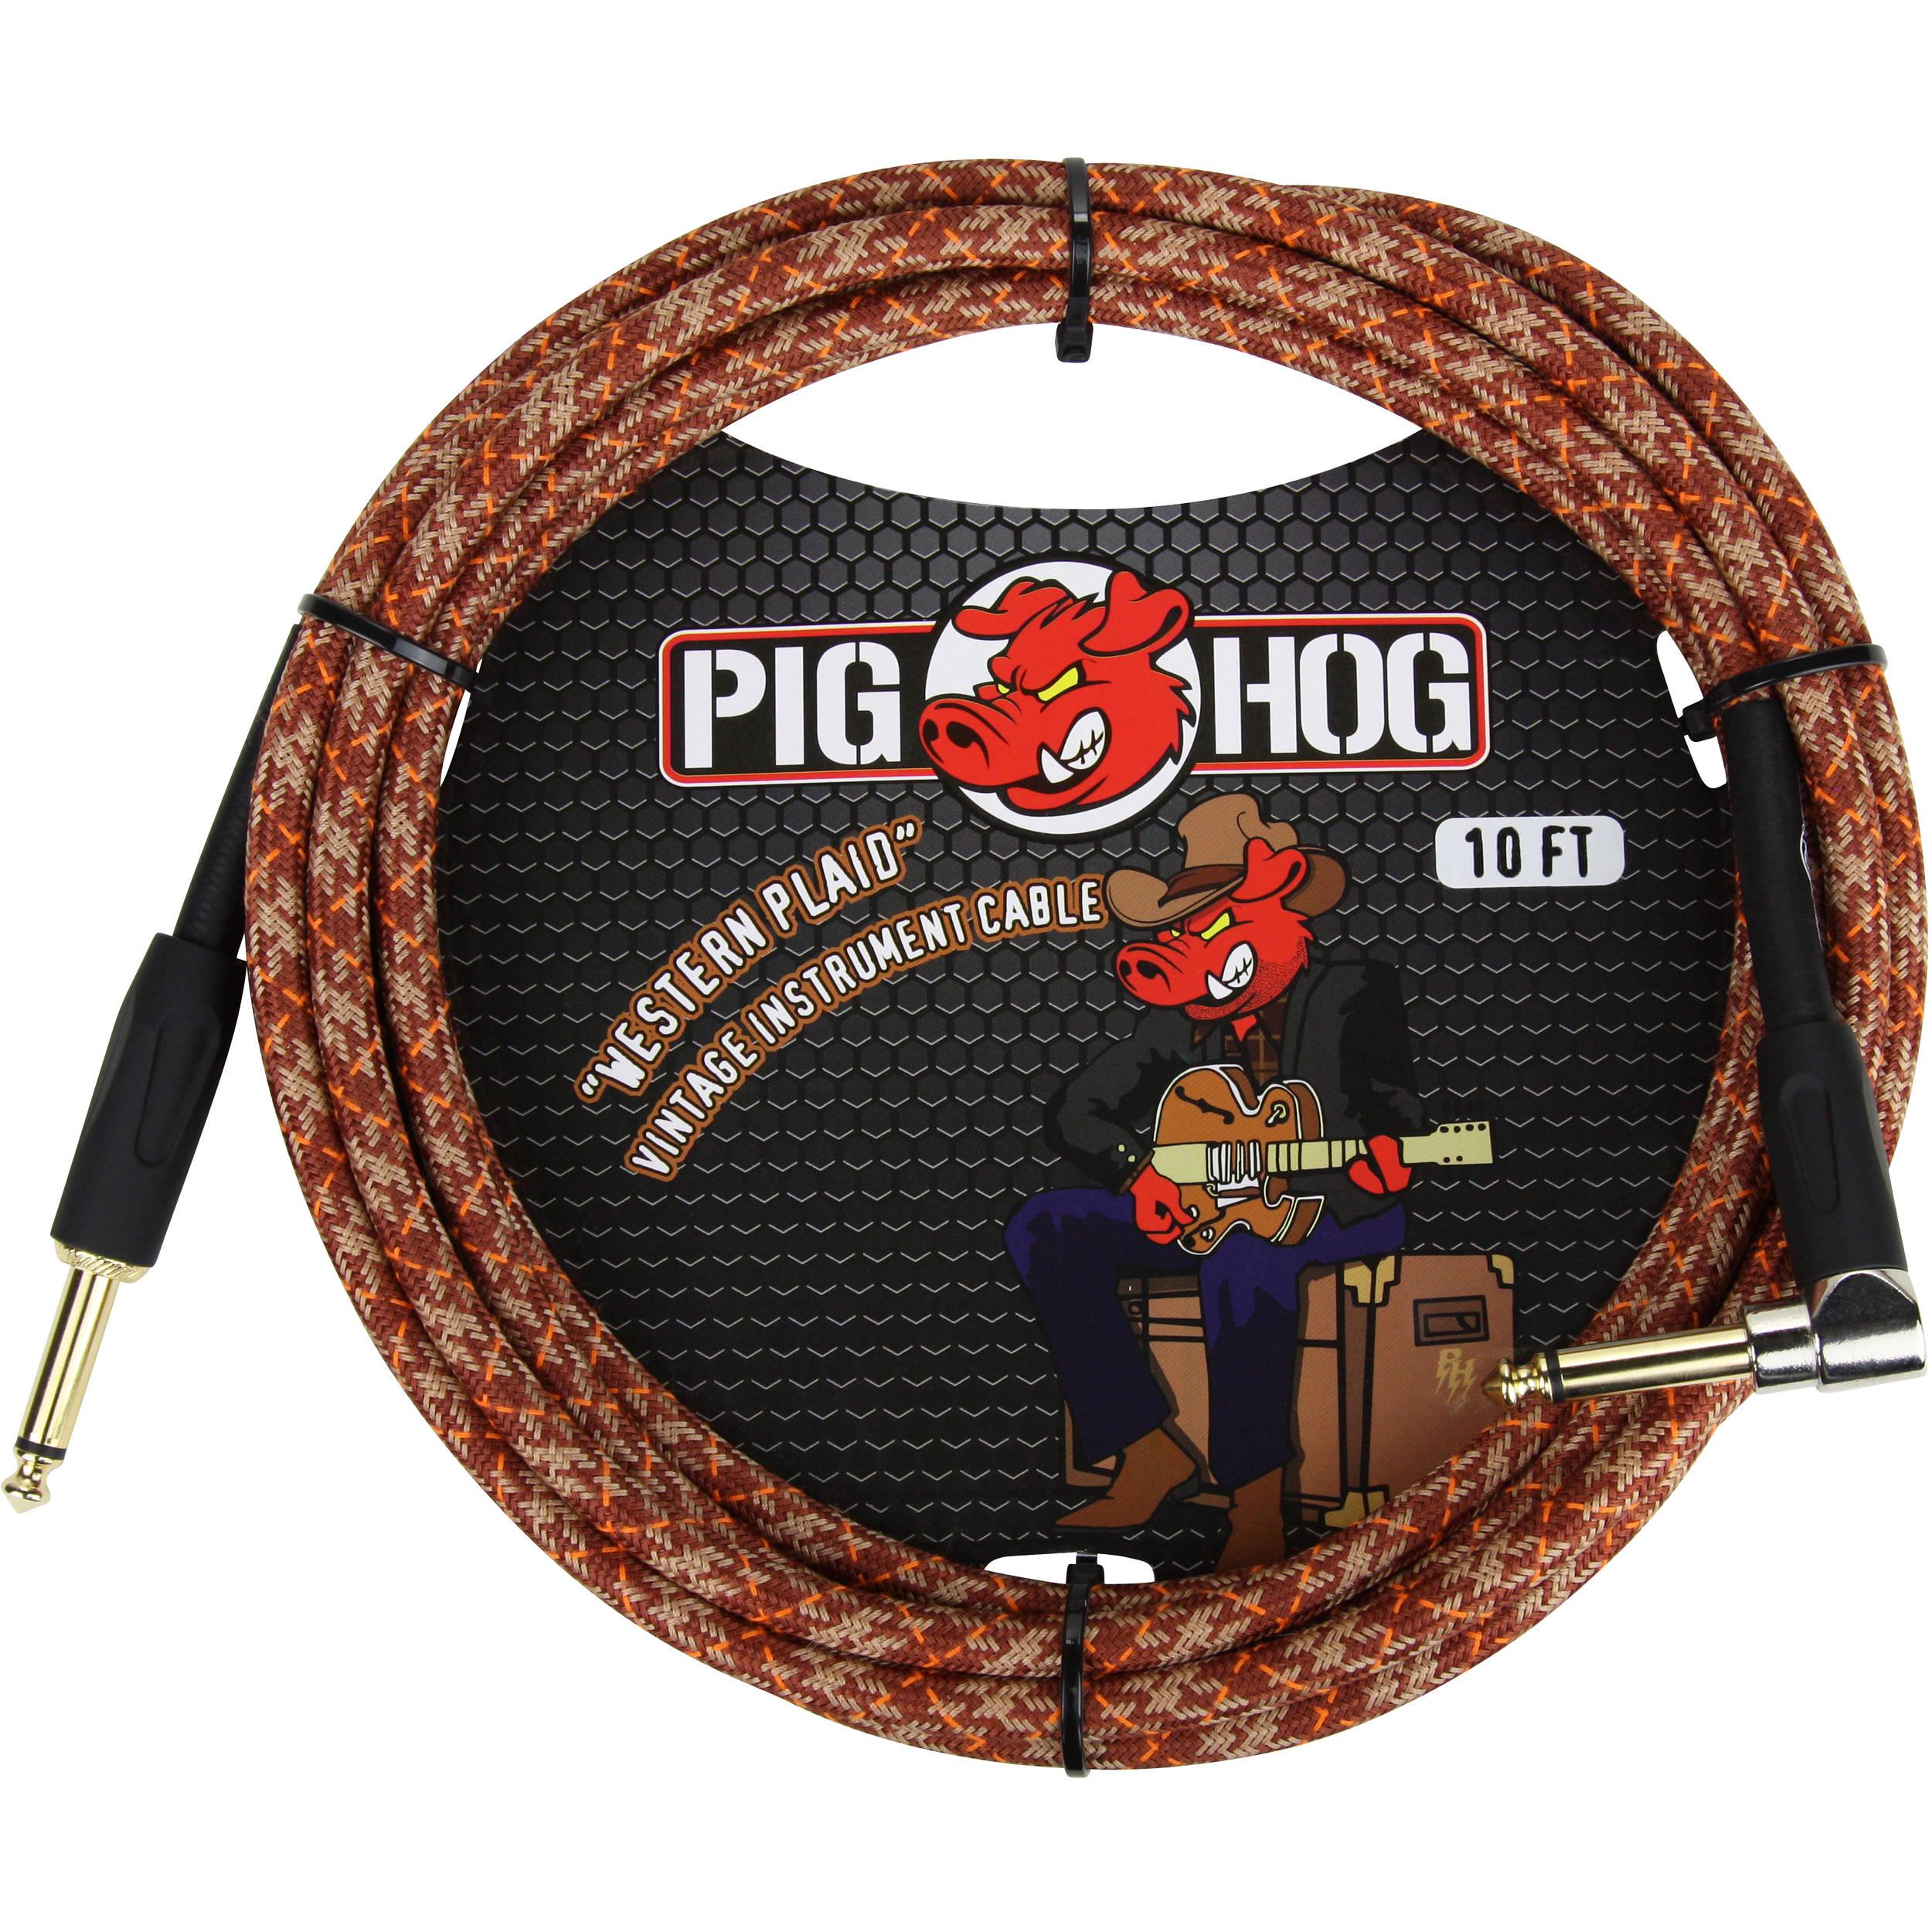 PIG HOG 10 FT WESTERN PLAID